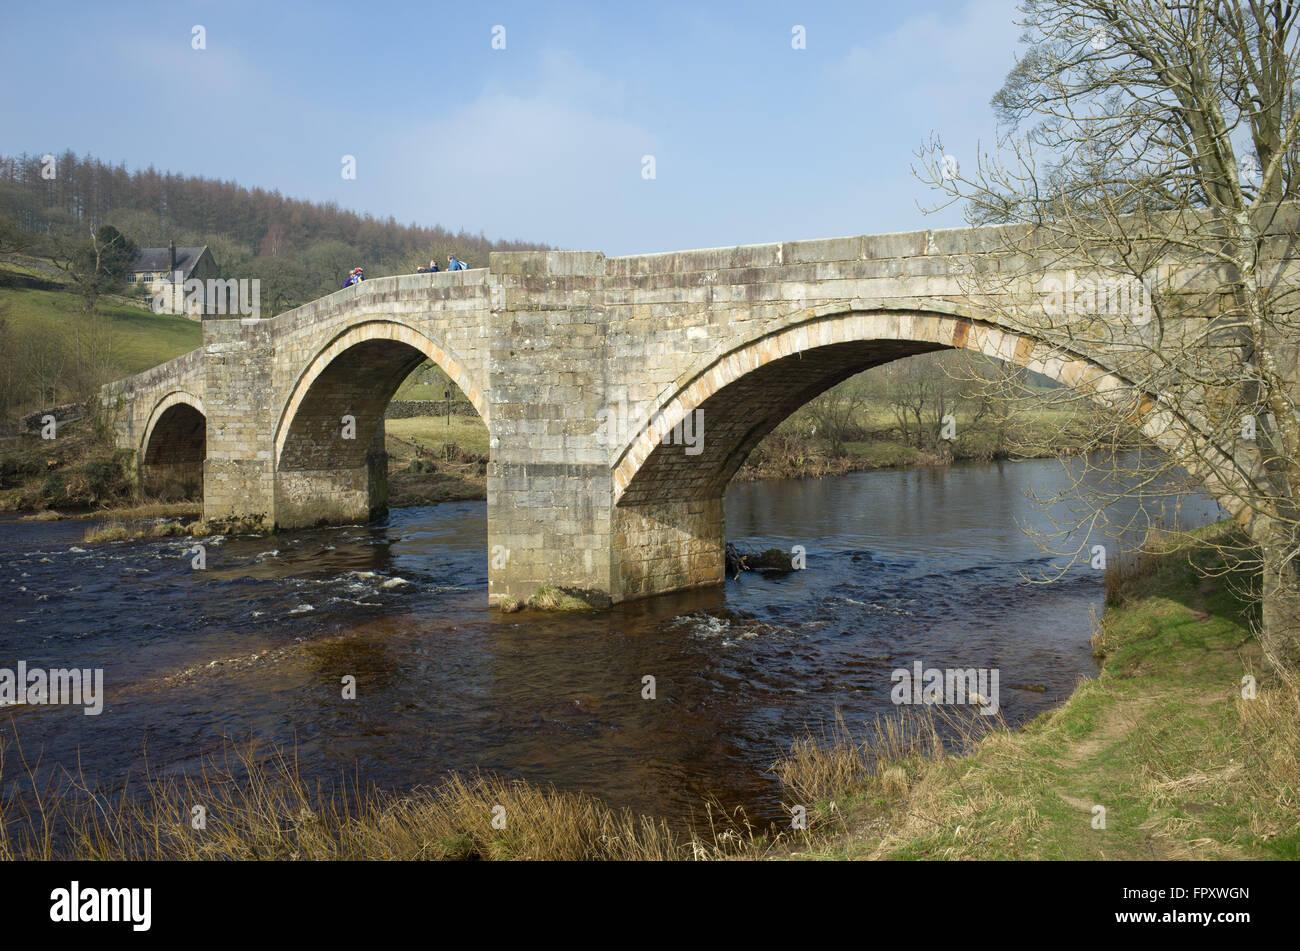 Barden Bridge Bolton Abbey, crossing the river Wharfe - Stock Image